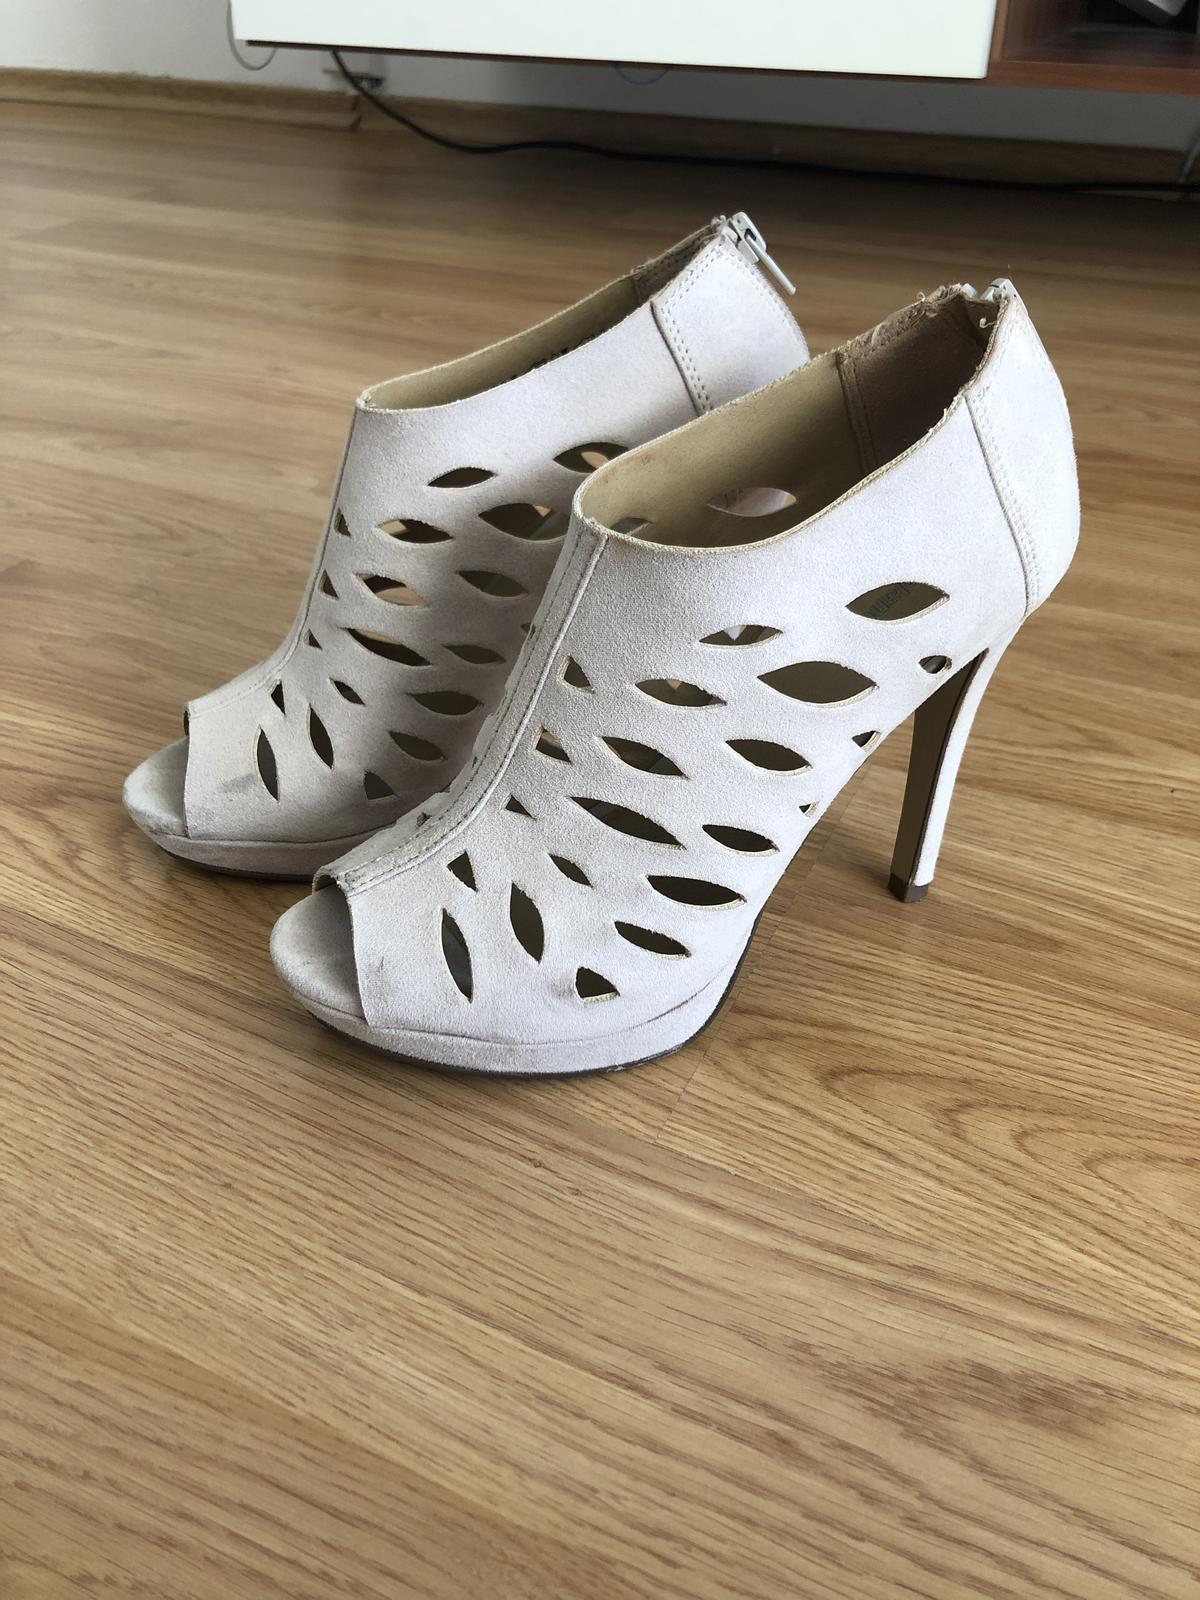 Smotanove sandalky - Obrázok č. 1